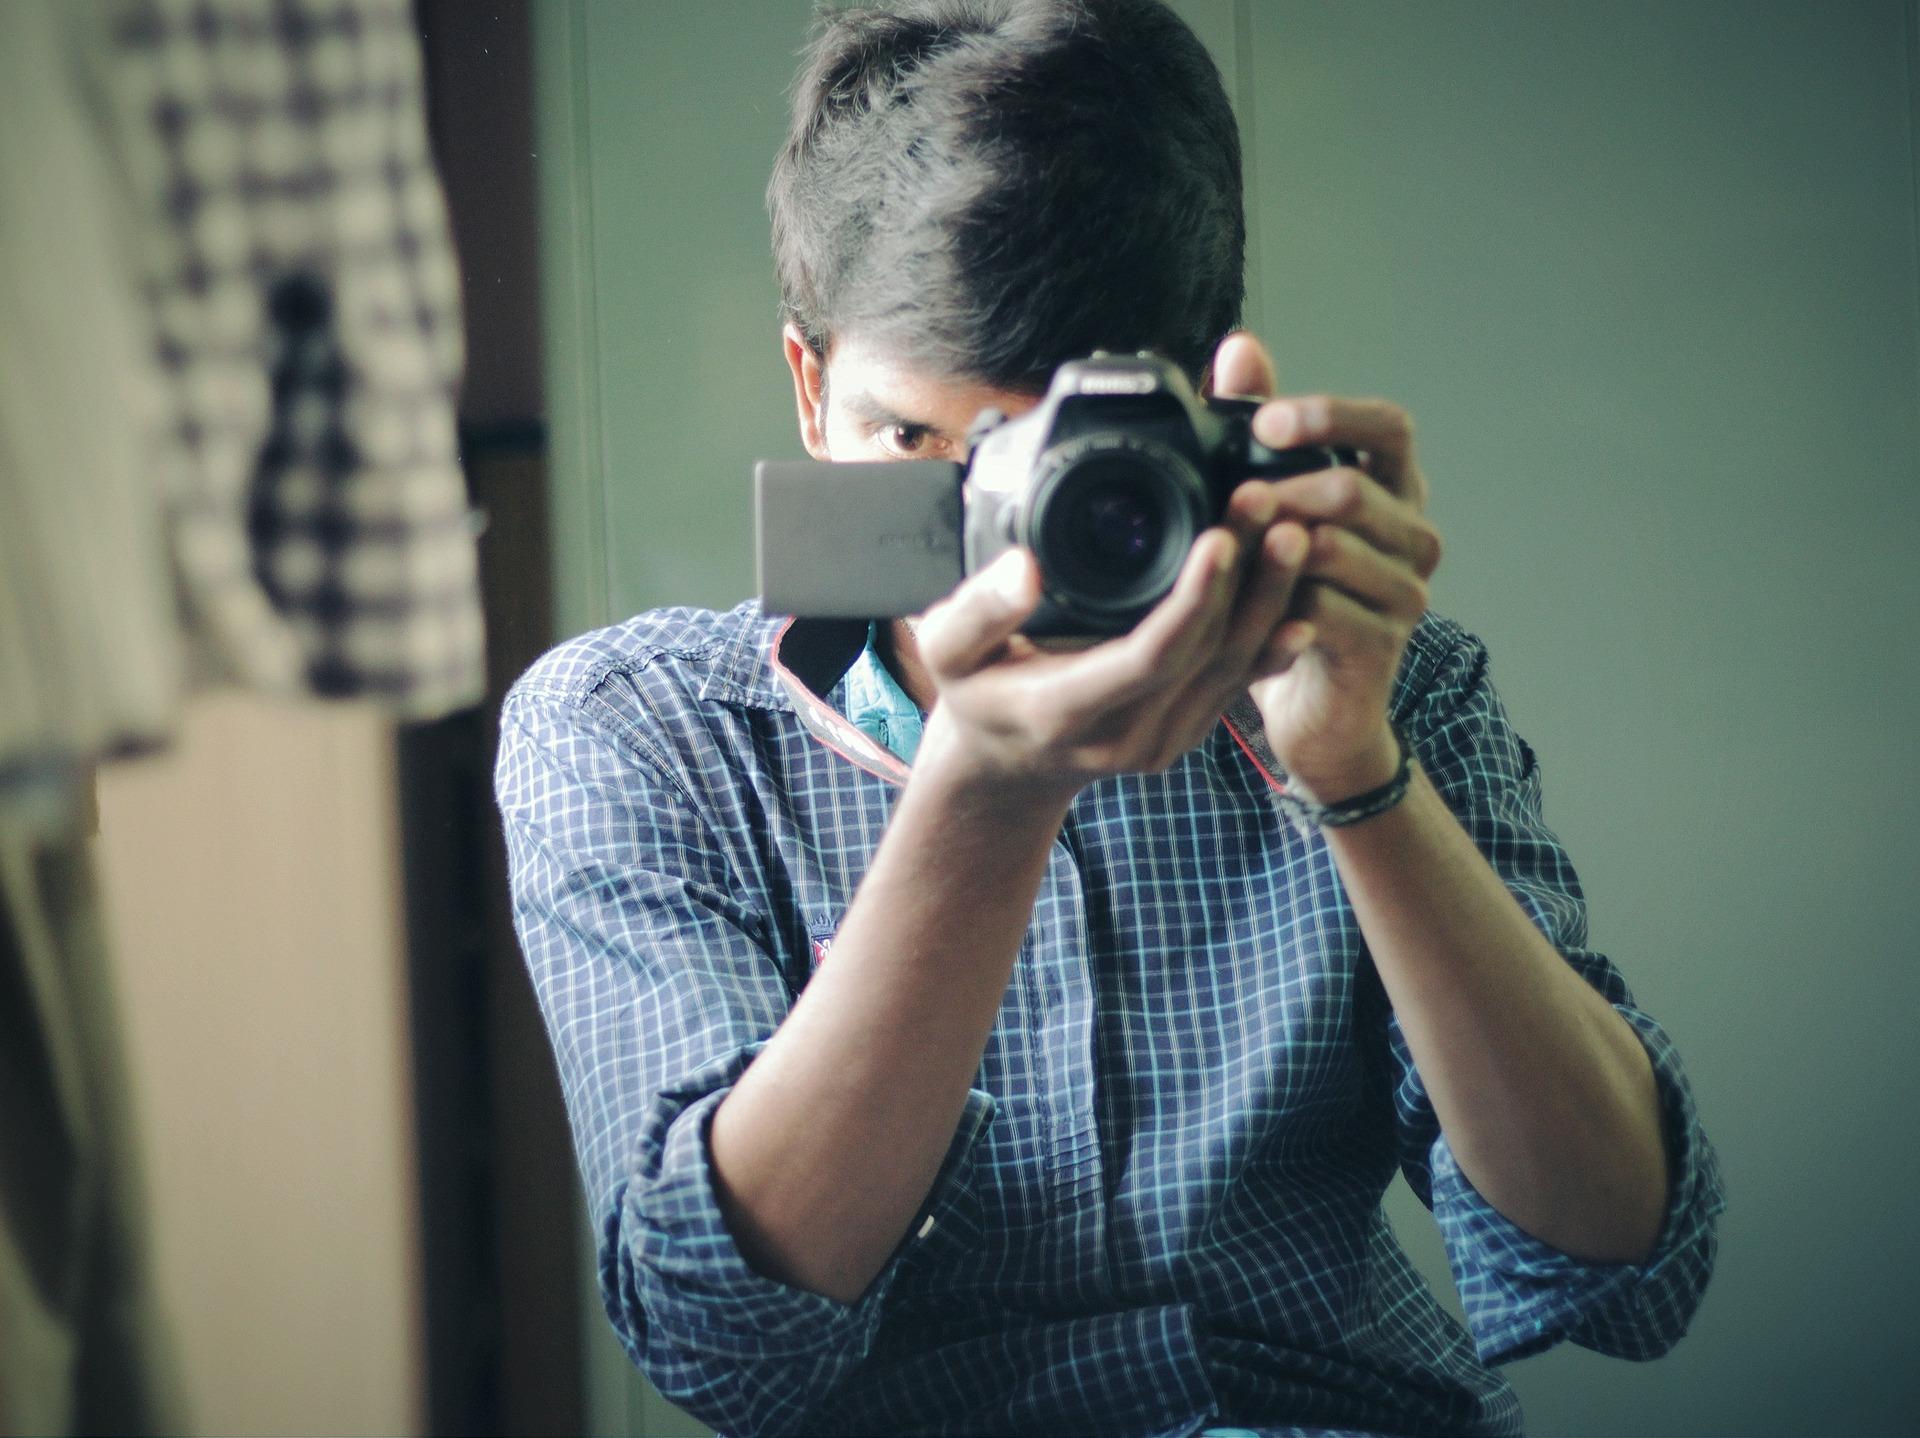 camera-1444364_1920